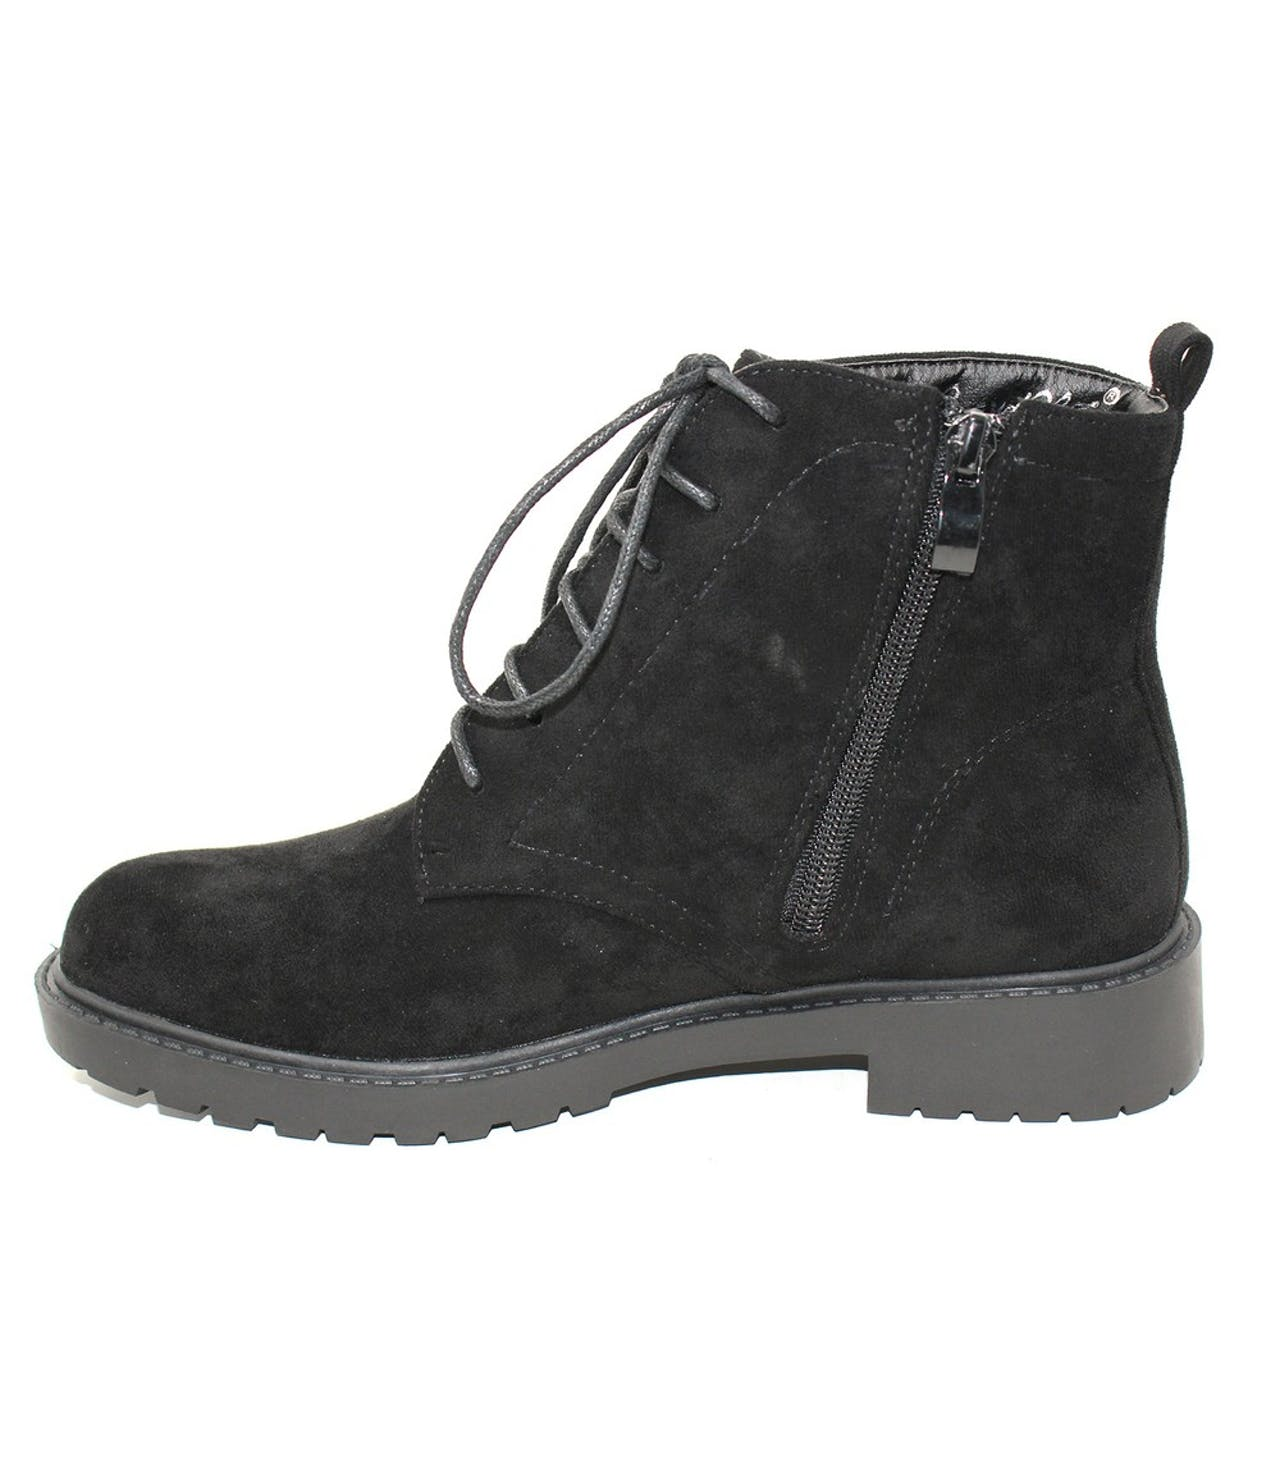 Shoe Lounge Faux Suede Desert Boot In Black